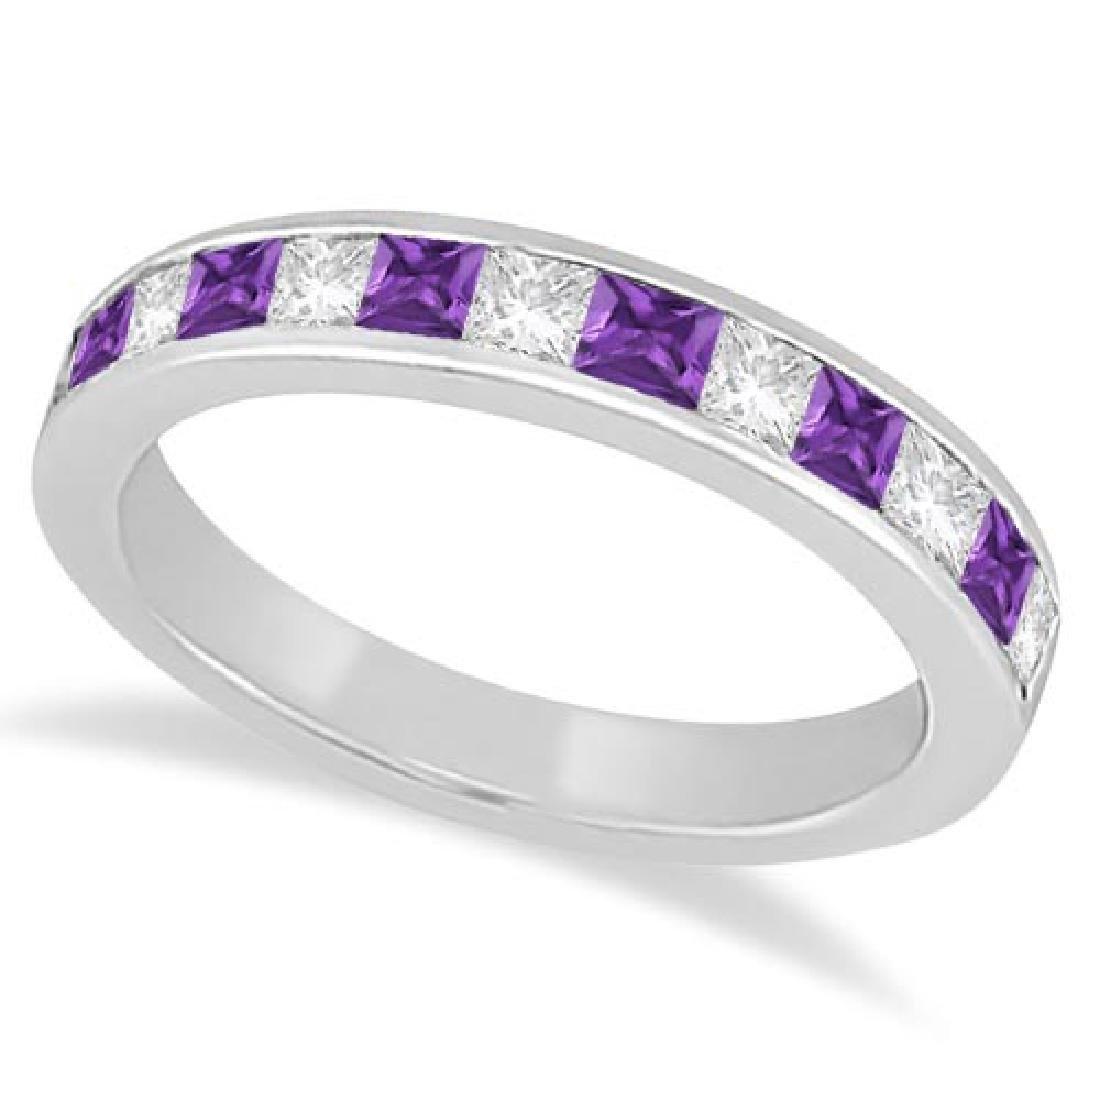 Channel Amethyst and Diamond Wedding Ring 14k White Gol